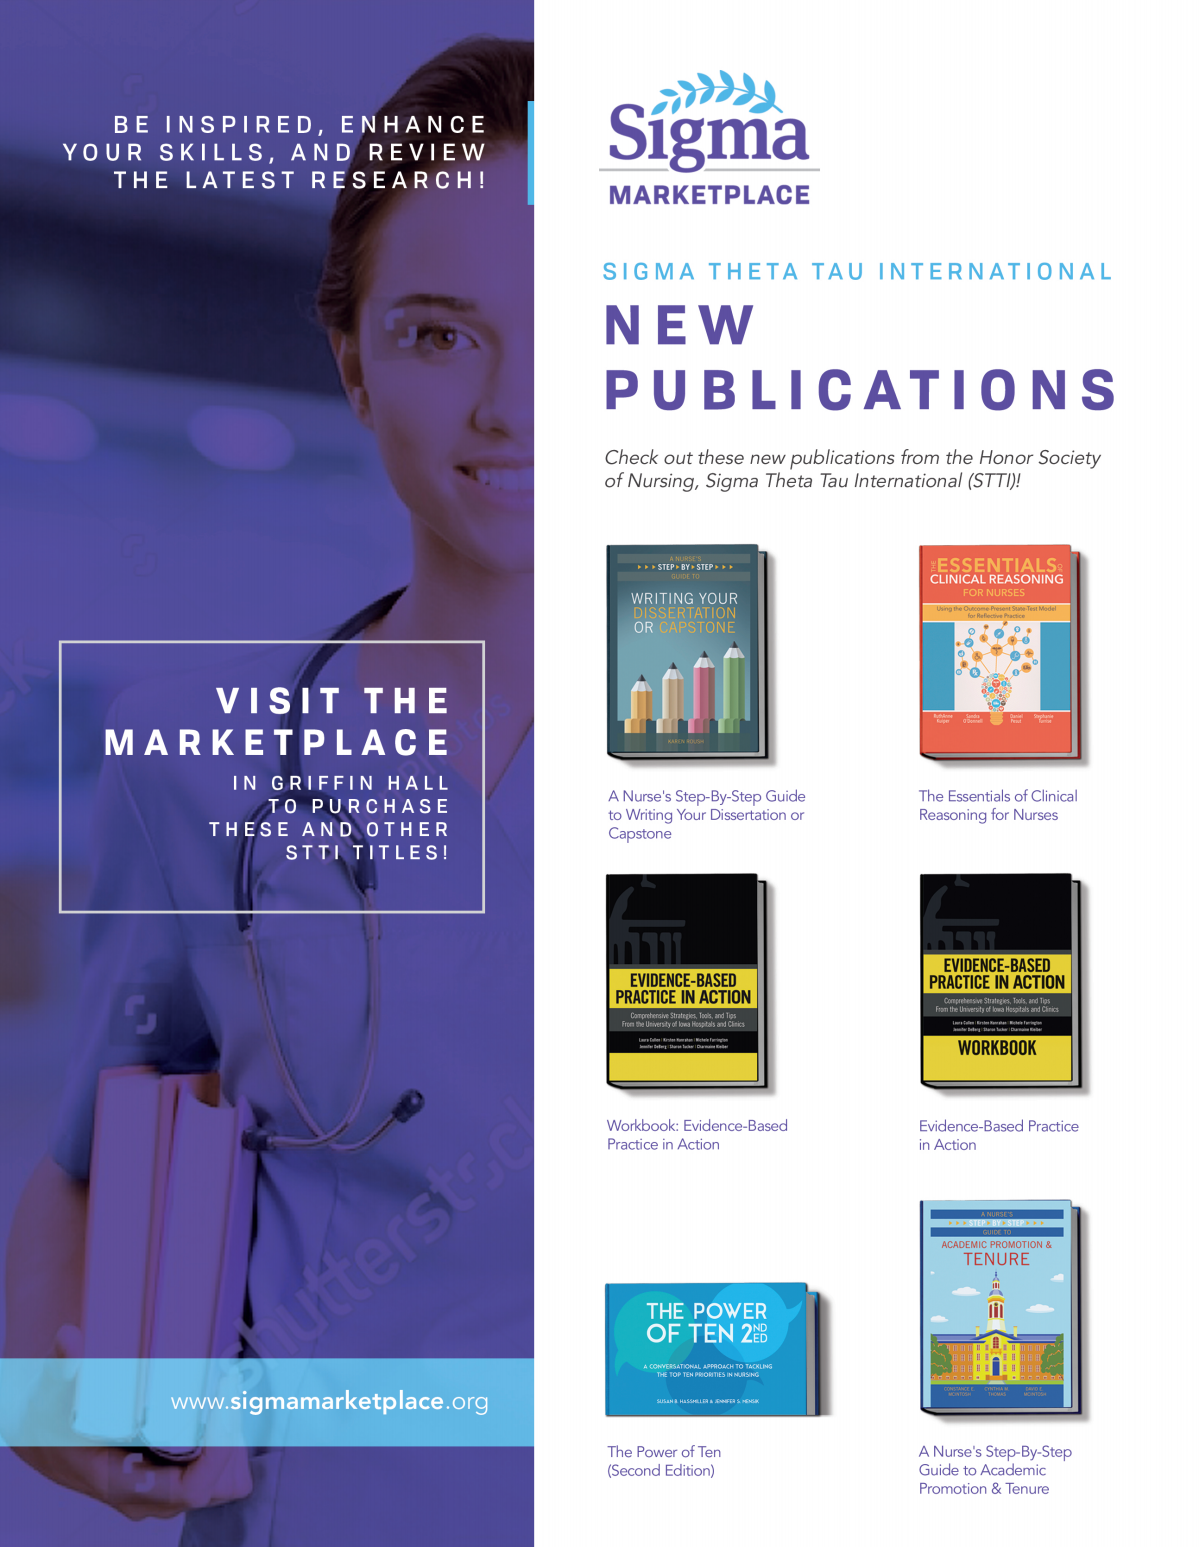 Event Program Book Ads for Sigma Marketplace